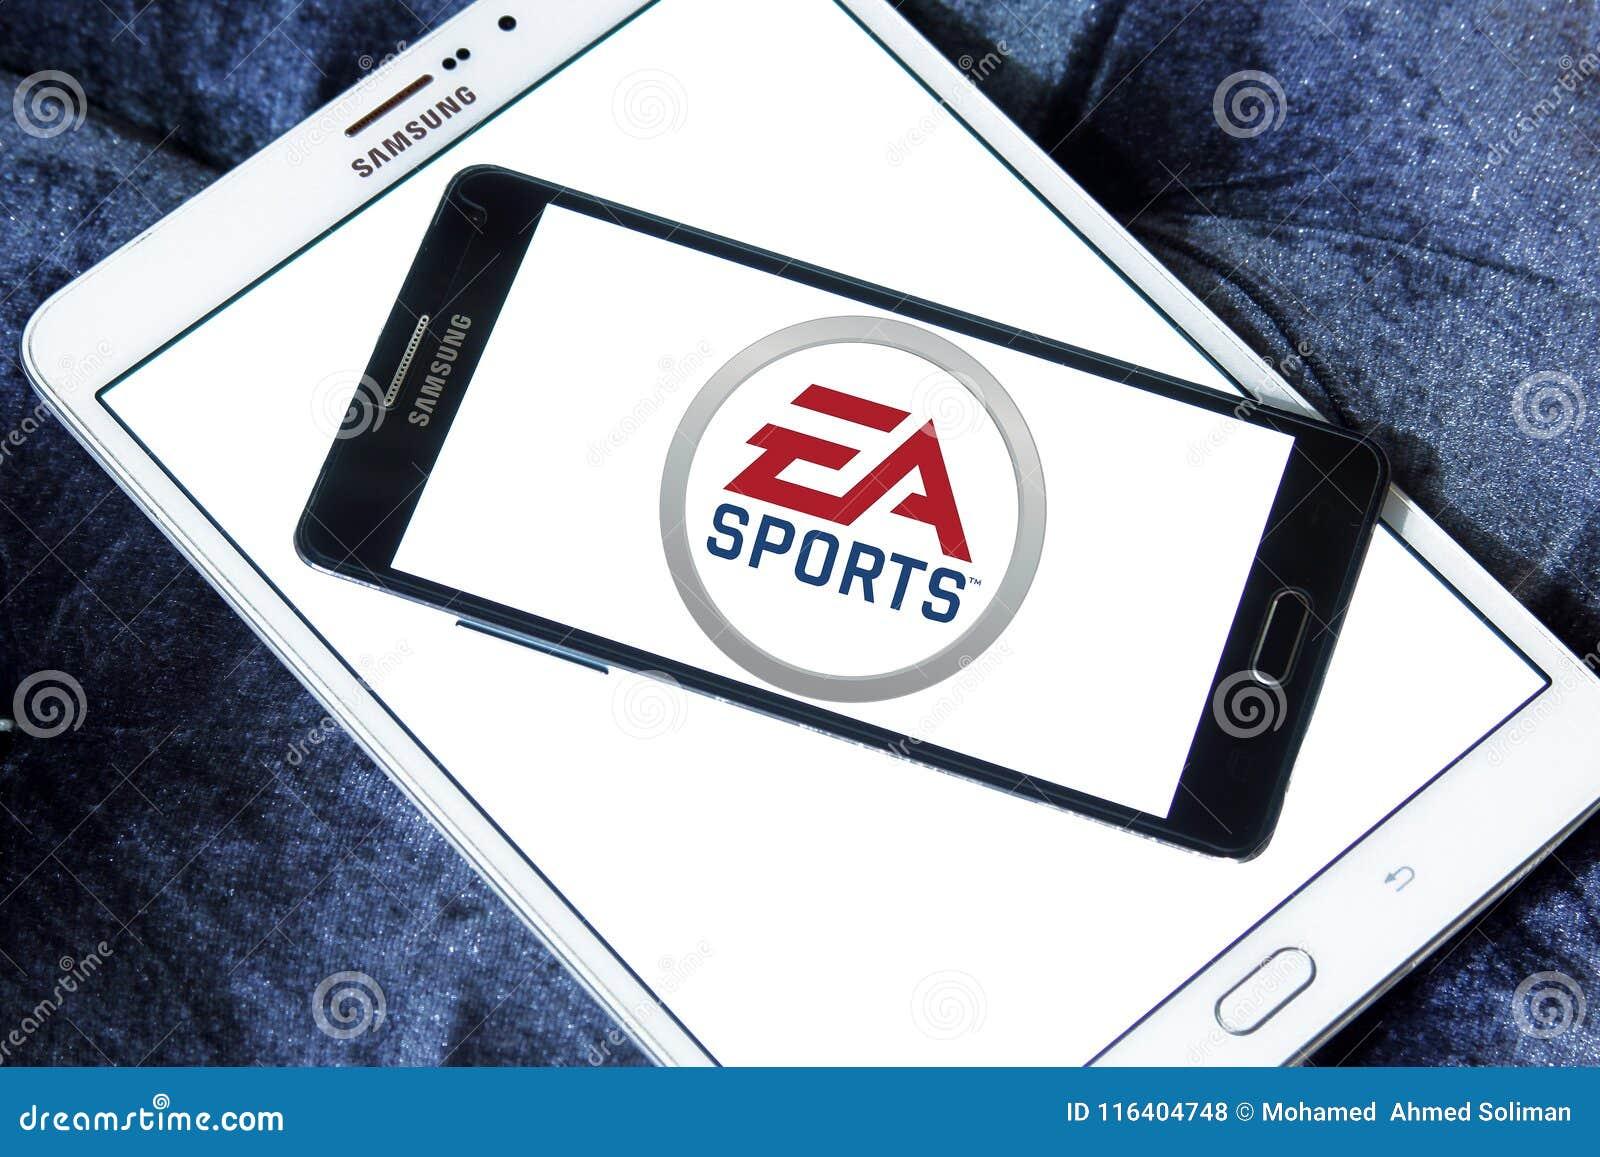 Ea Sports Logo Editorial Stock Photo Image Of Symbols 116404748